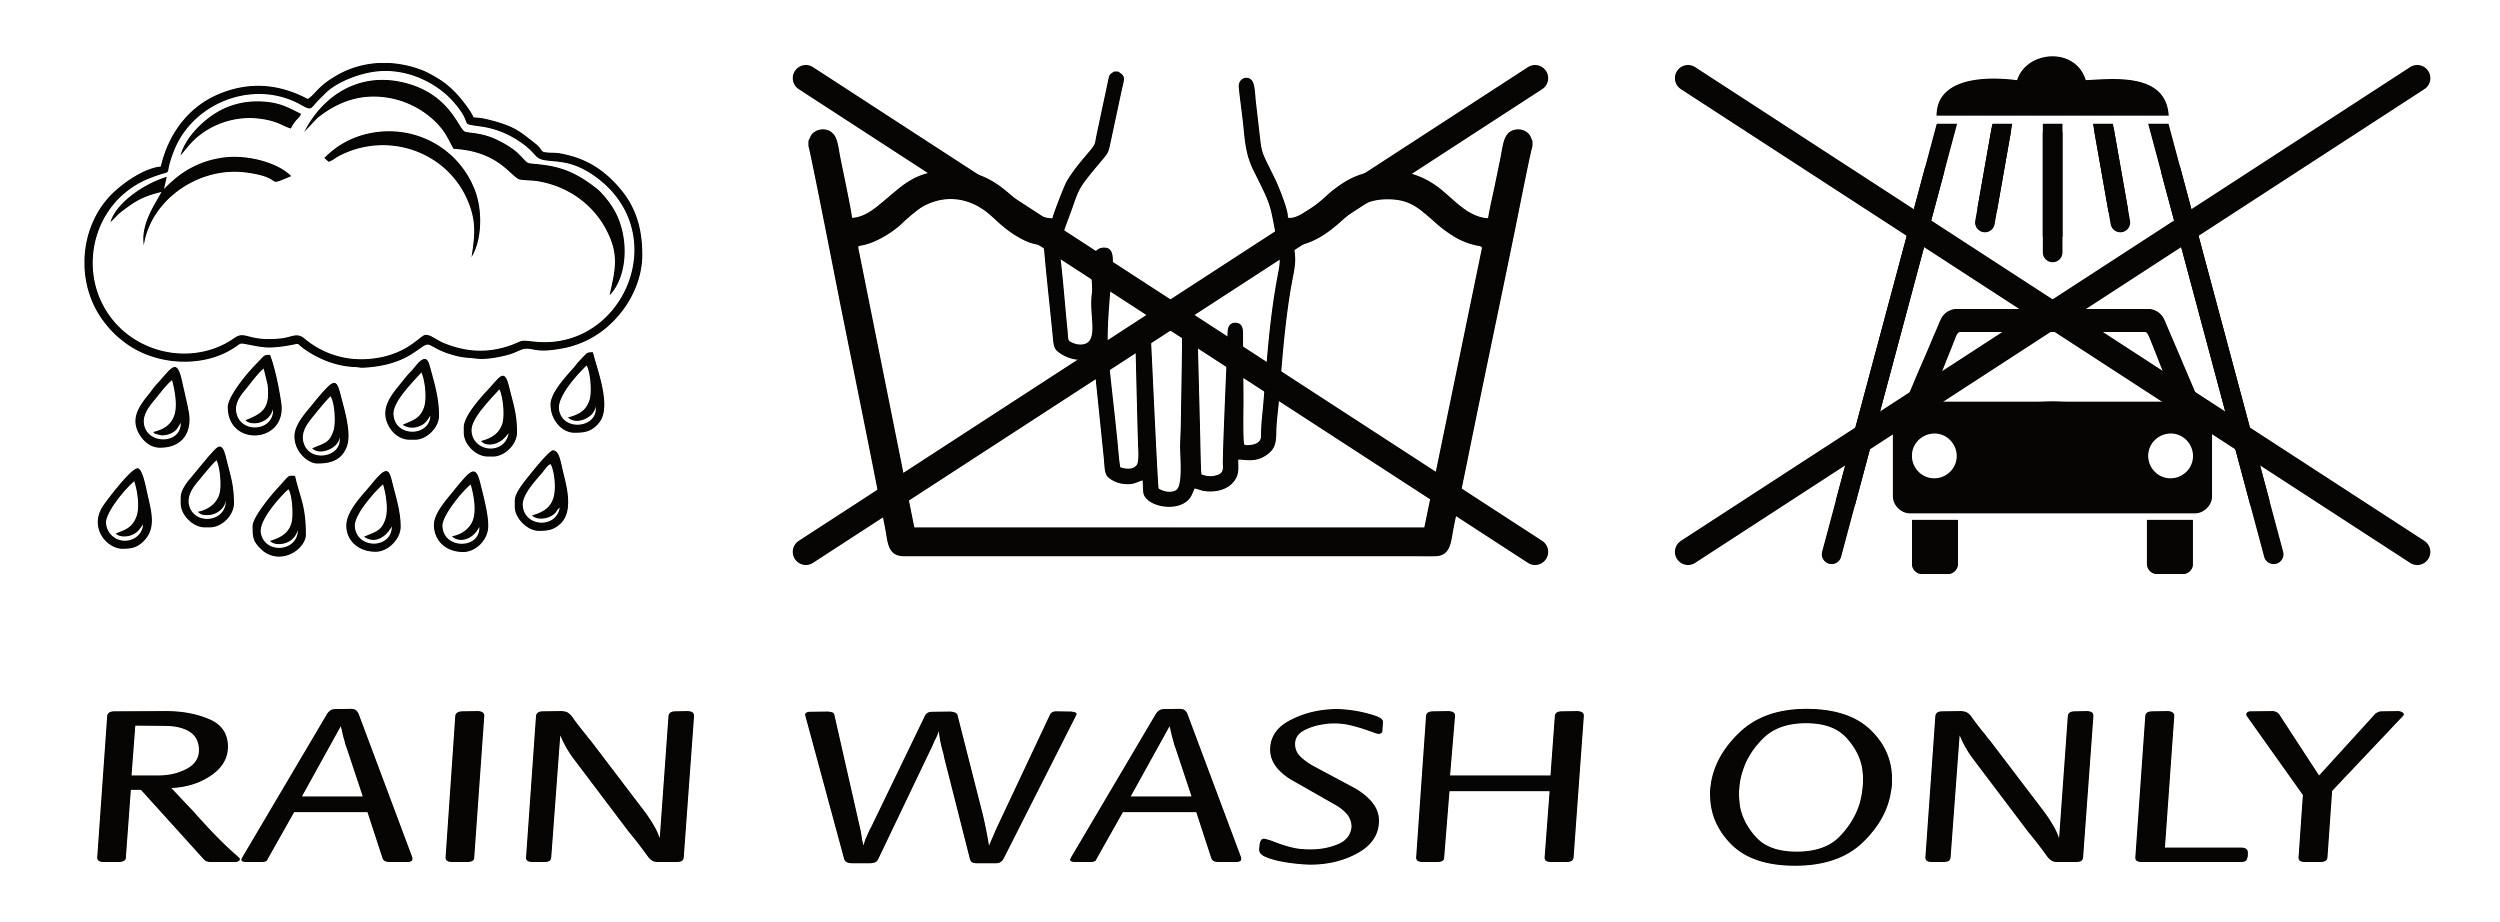 Autocollant Rain Wash Only 190 x 70 mm – Bild 1